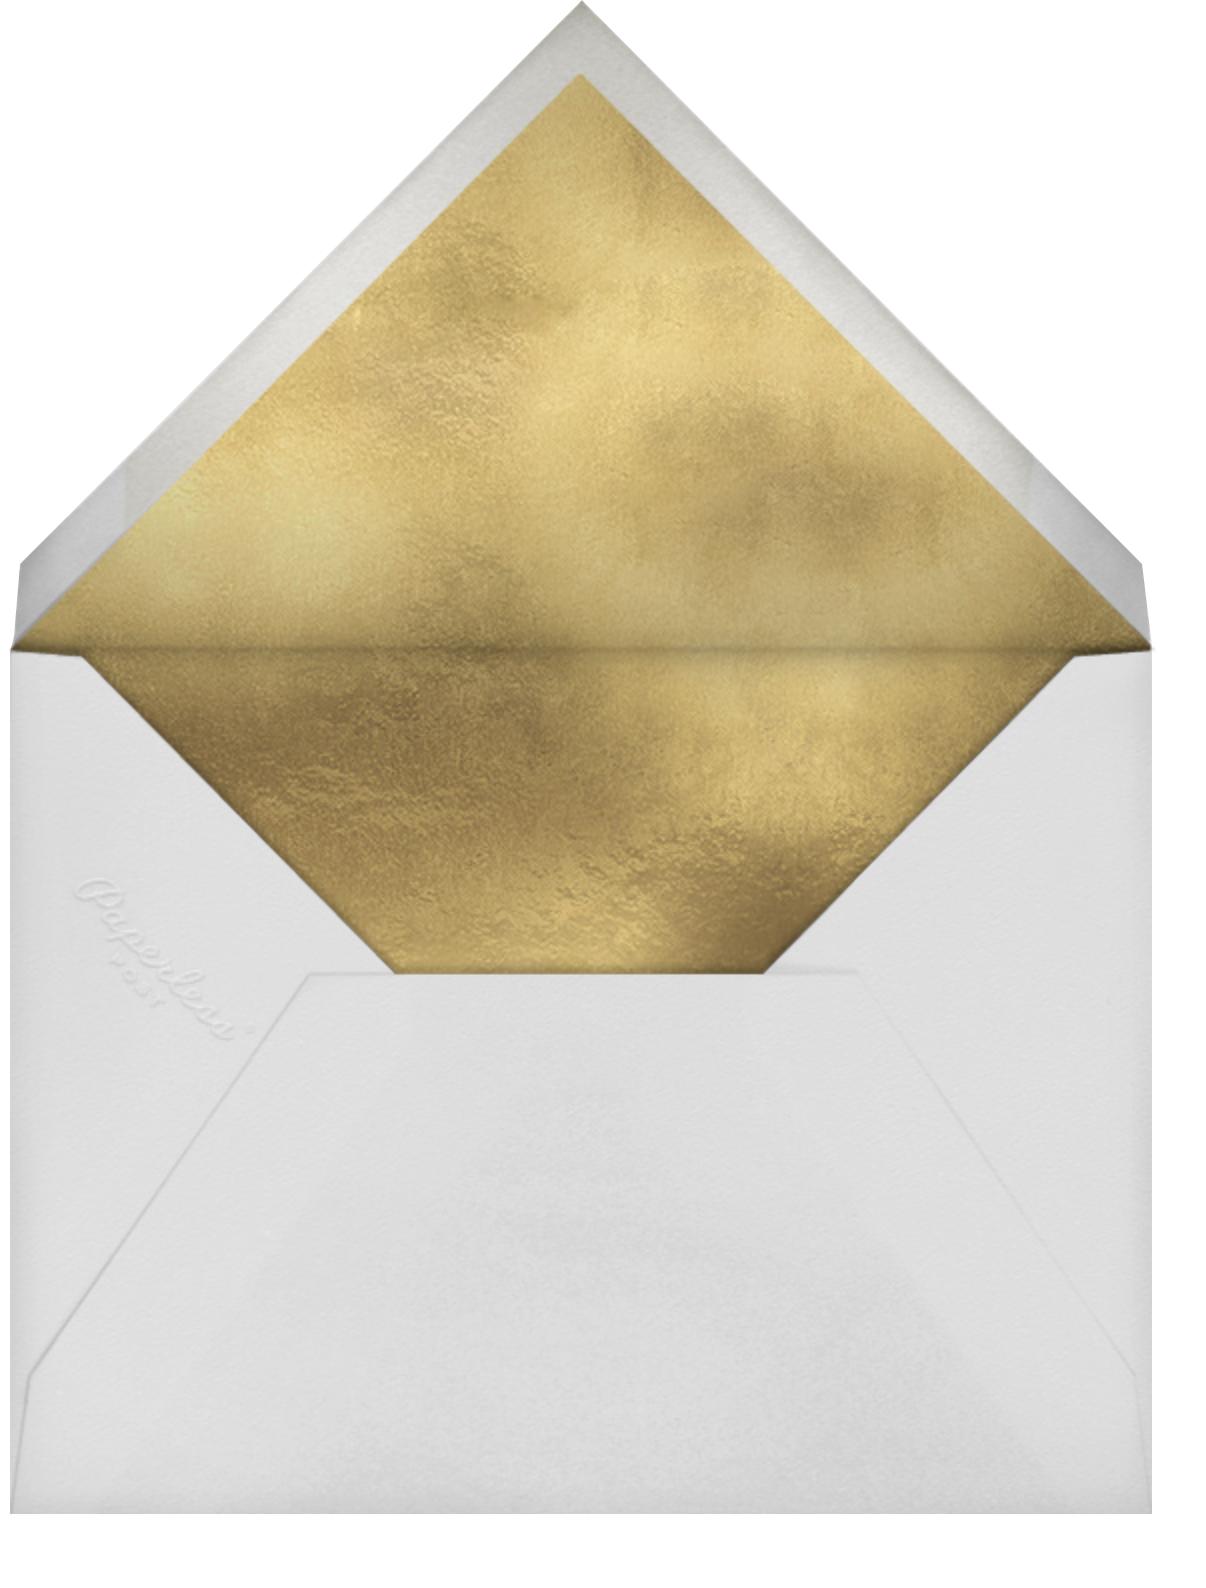 Metallic and Mistletoe - kate spade new york - Company holiday party - envelope back